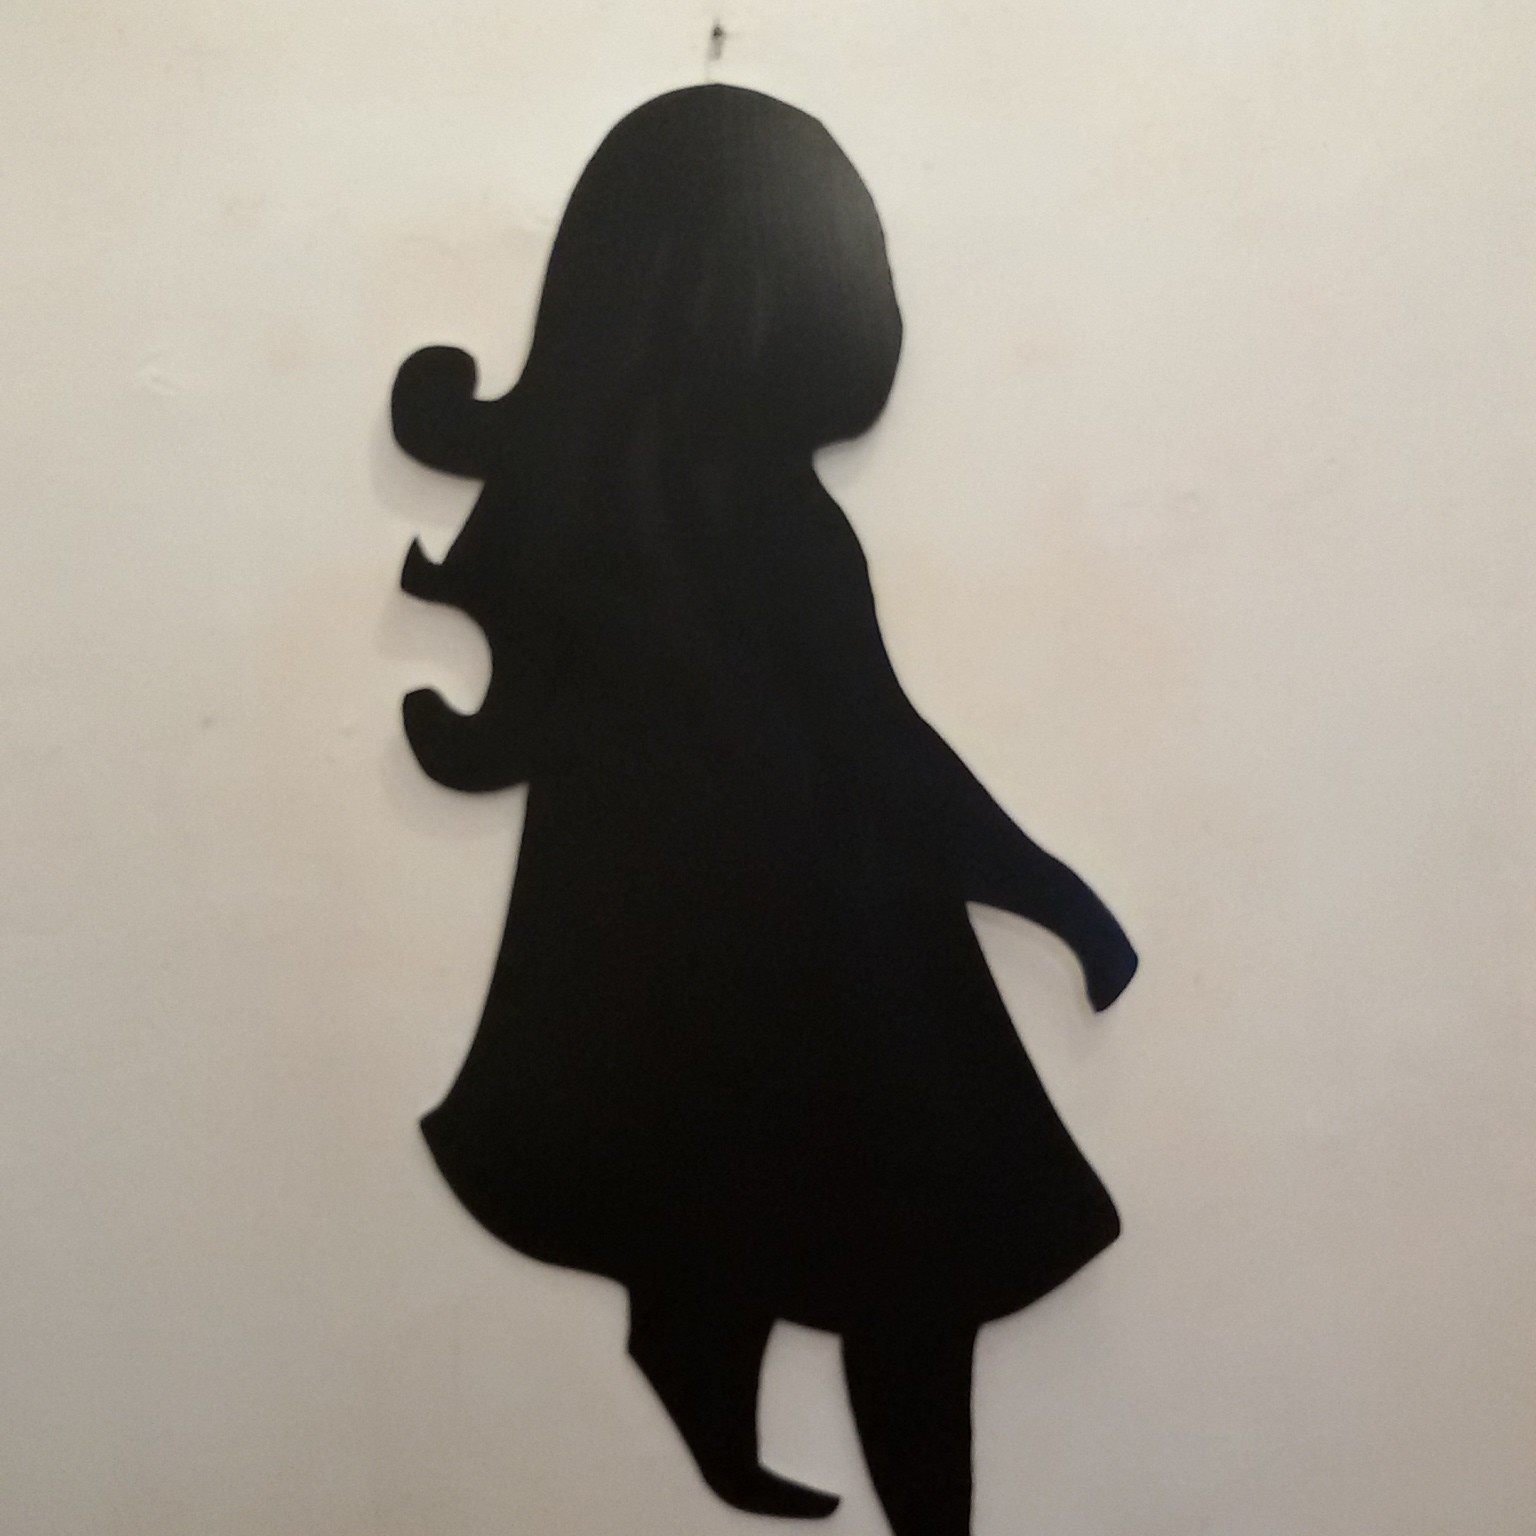 La bambina di Pamela Da Costa